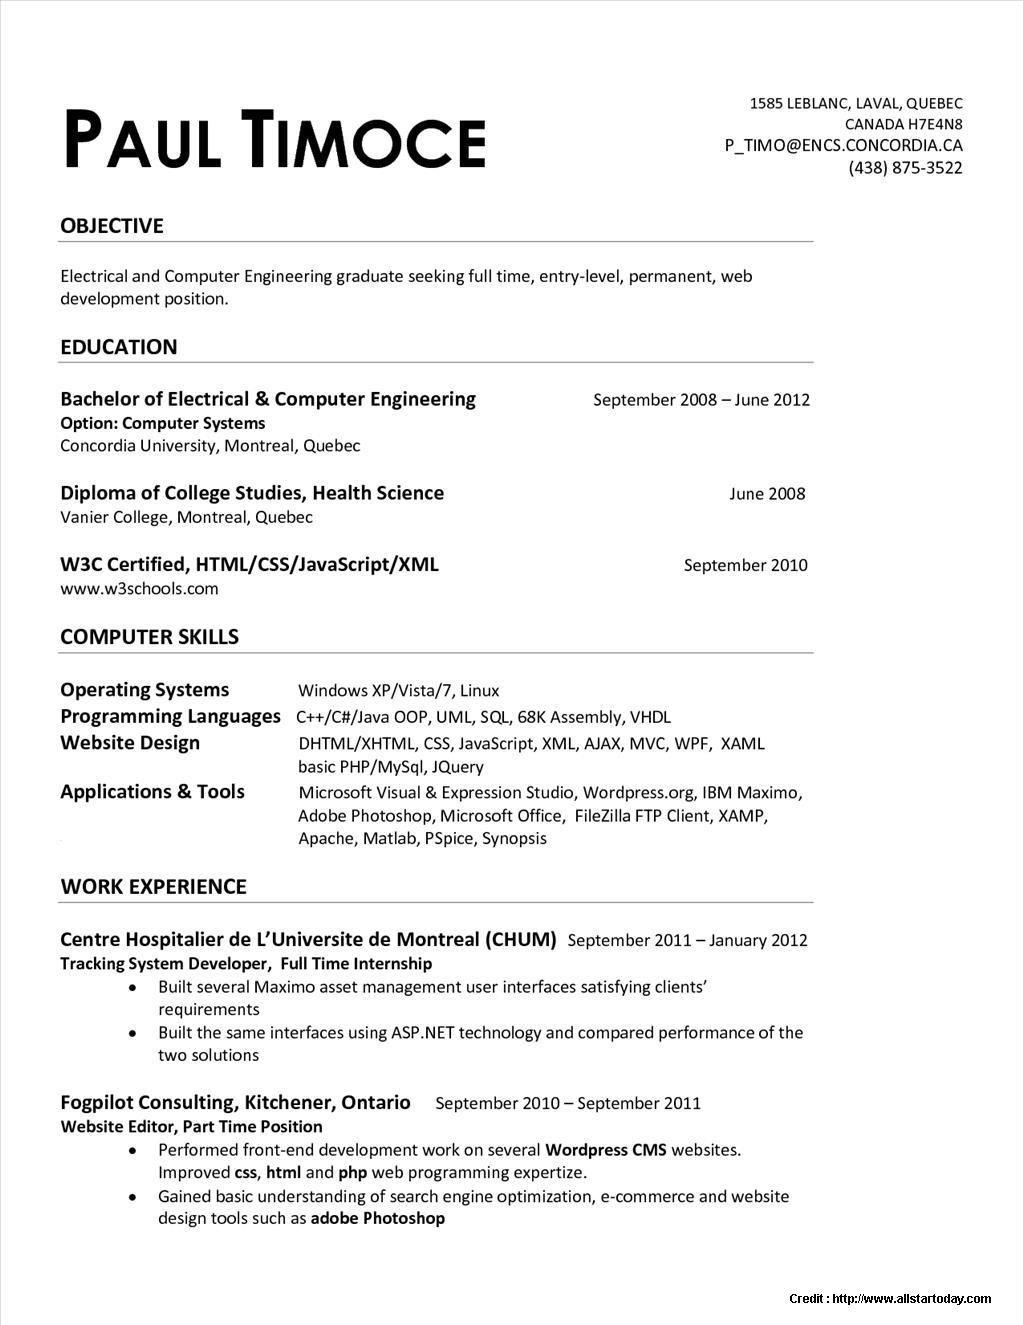 Curriculum vitae quebec - laboite-cv.fr